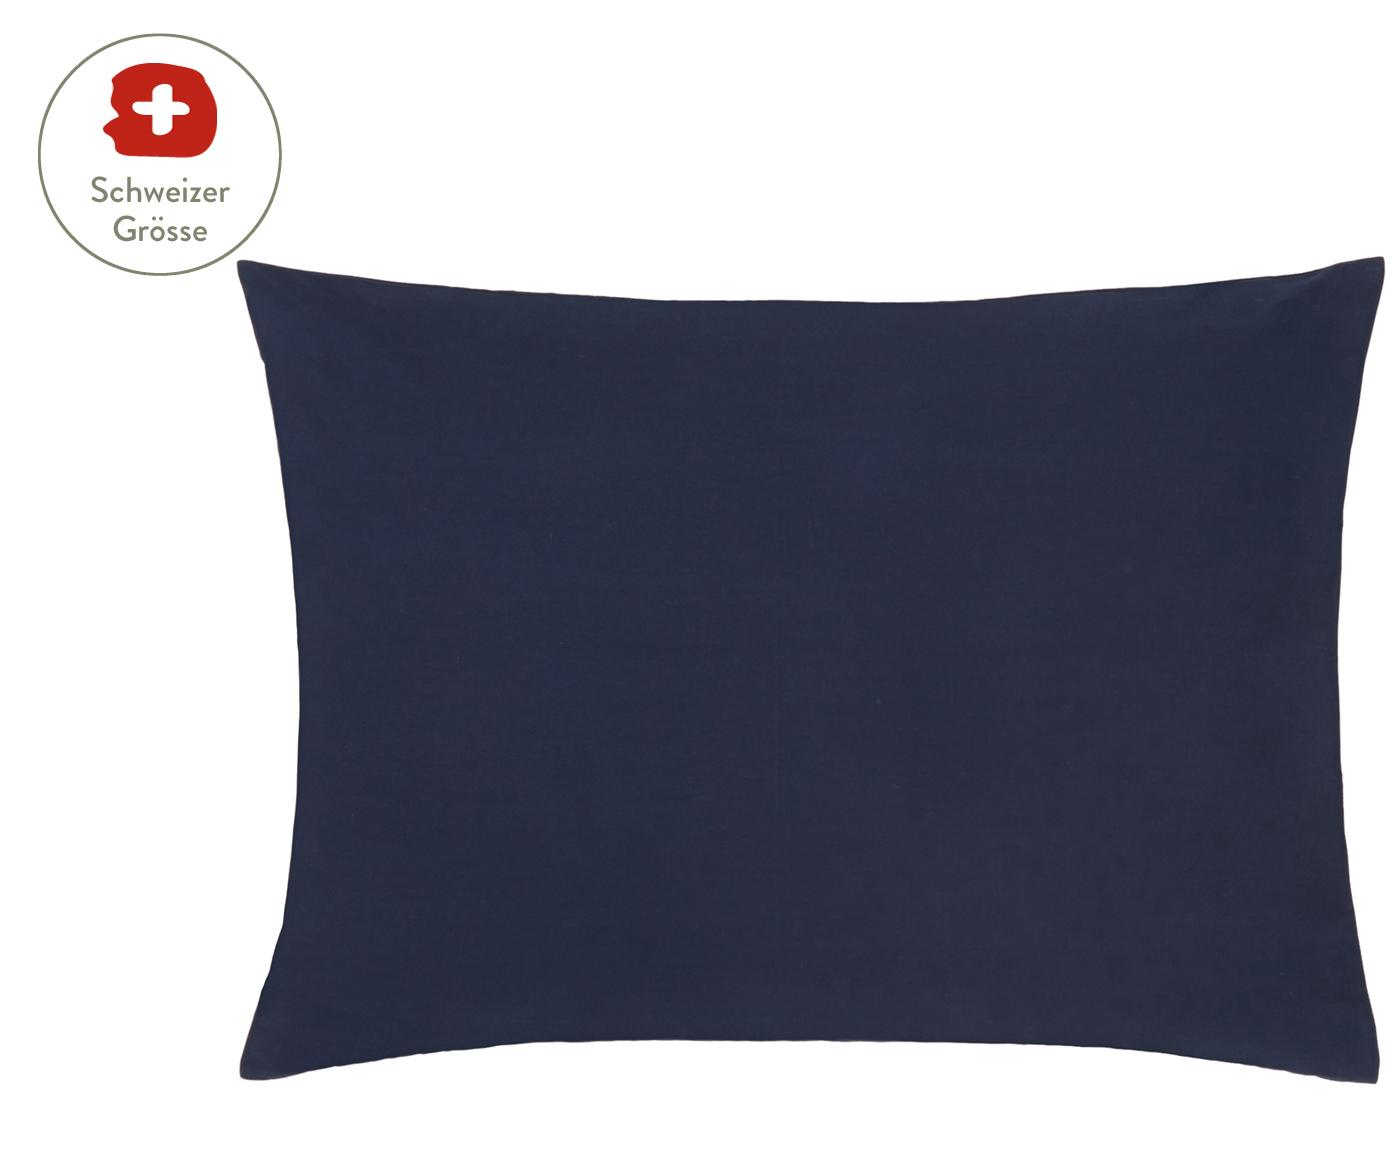 Baumwollperkal-Kissenbezug Elsie in Dunkelblau, Webart: Perkal Fadendichte 200 TC, Dunkelblau, 50 x 70 cm